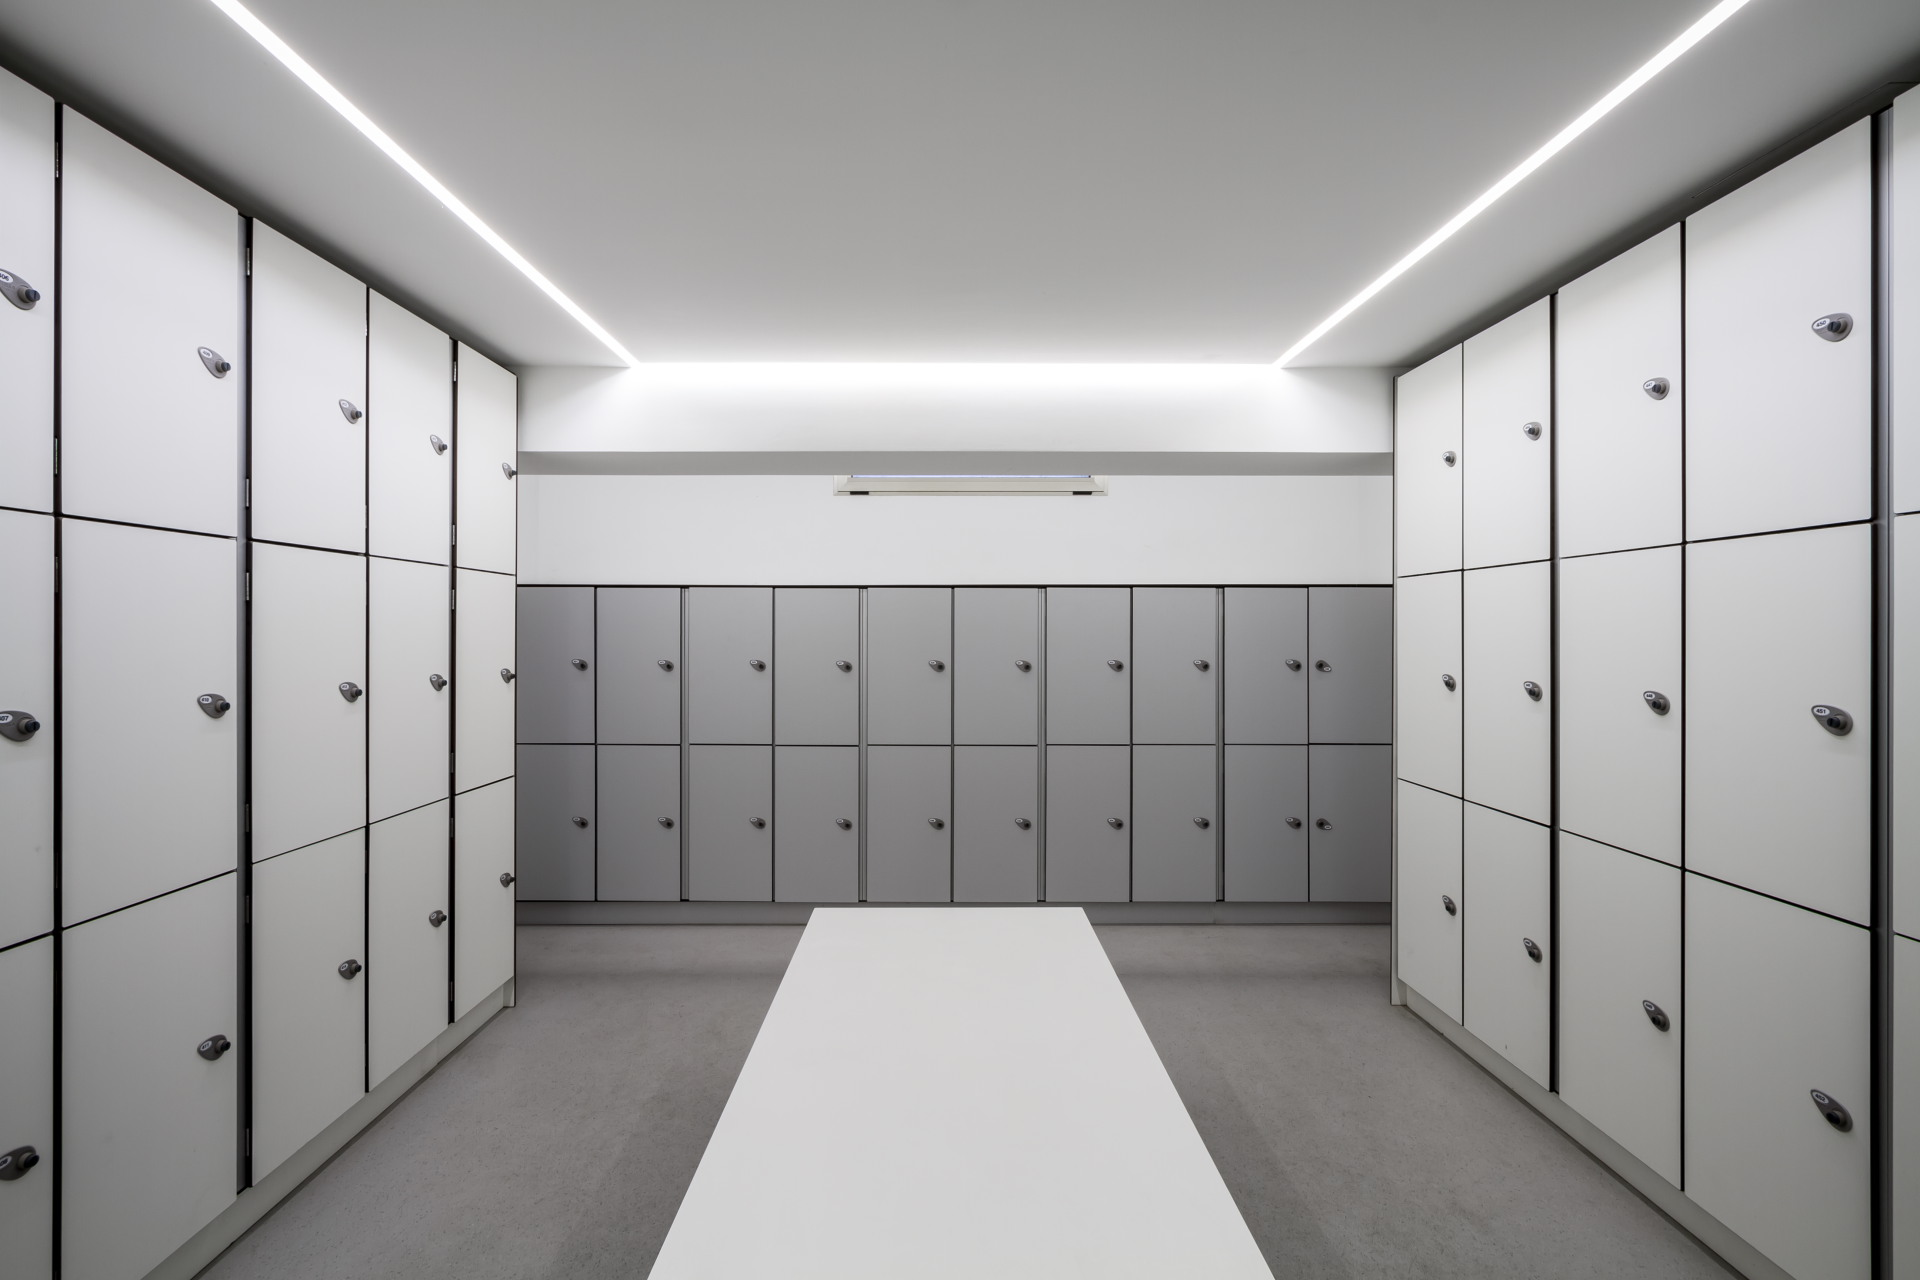 fotografia-arquitectura-valencia-german-cabo-bfm-edificatoria-club-tenis (14)